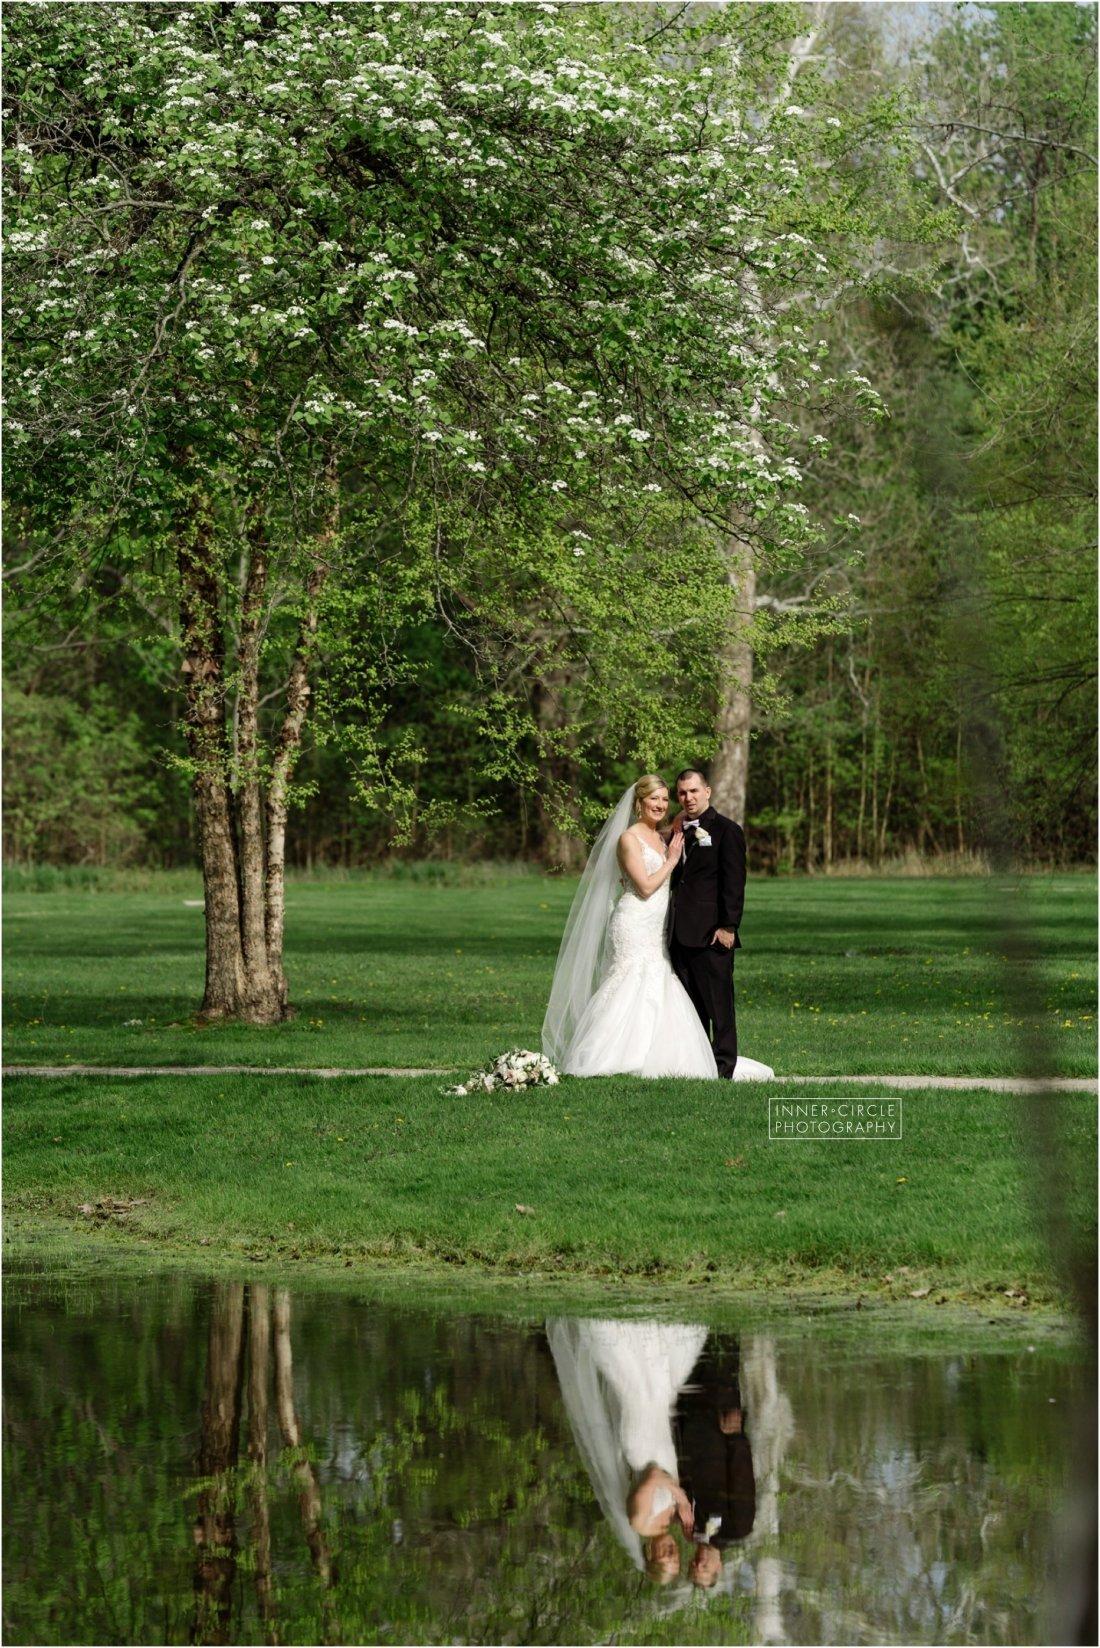 TommyChristina_WED_InnerCirclePhoto_569 Engagement - Wedding  Michigan Photography